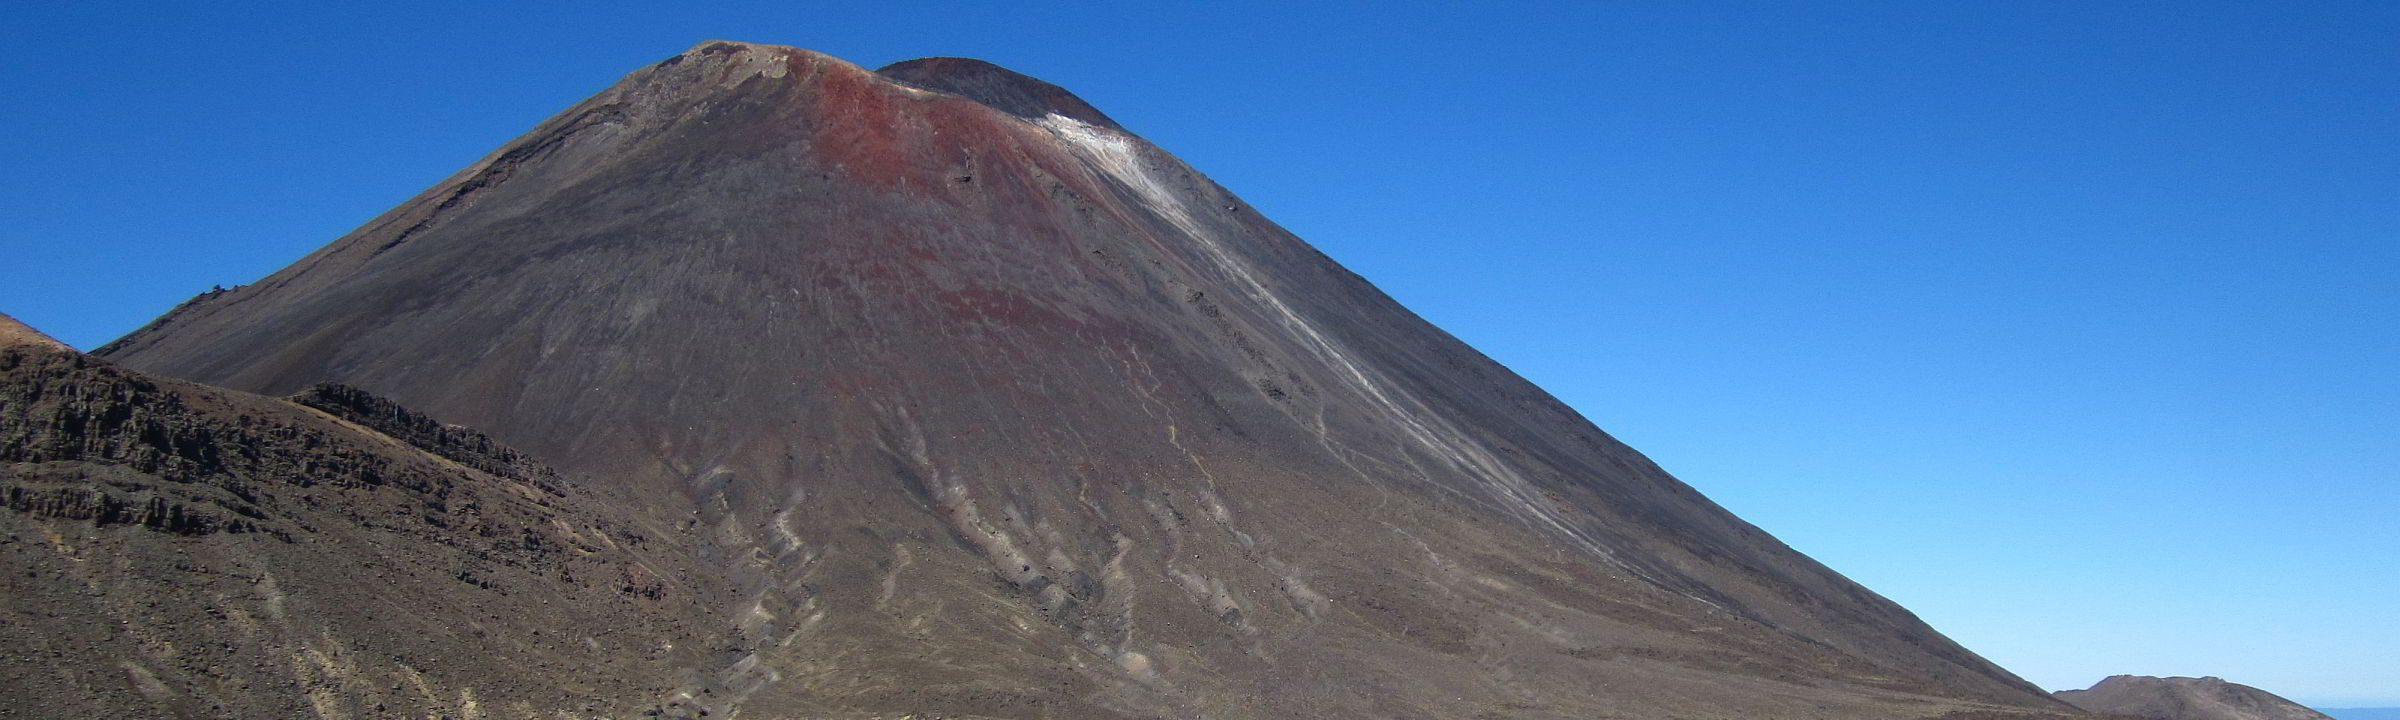 Tongariro Alpine Crossing – Tanz auf dem Vulkan